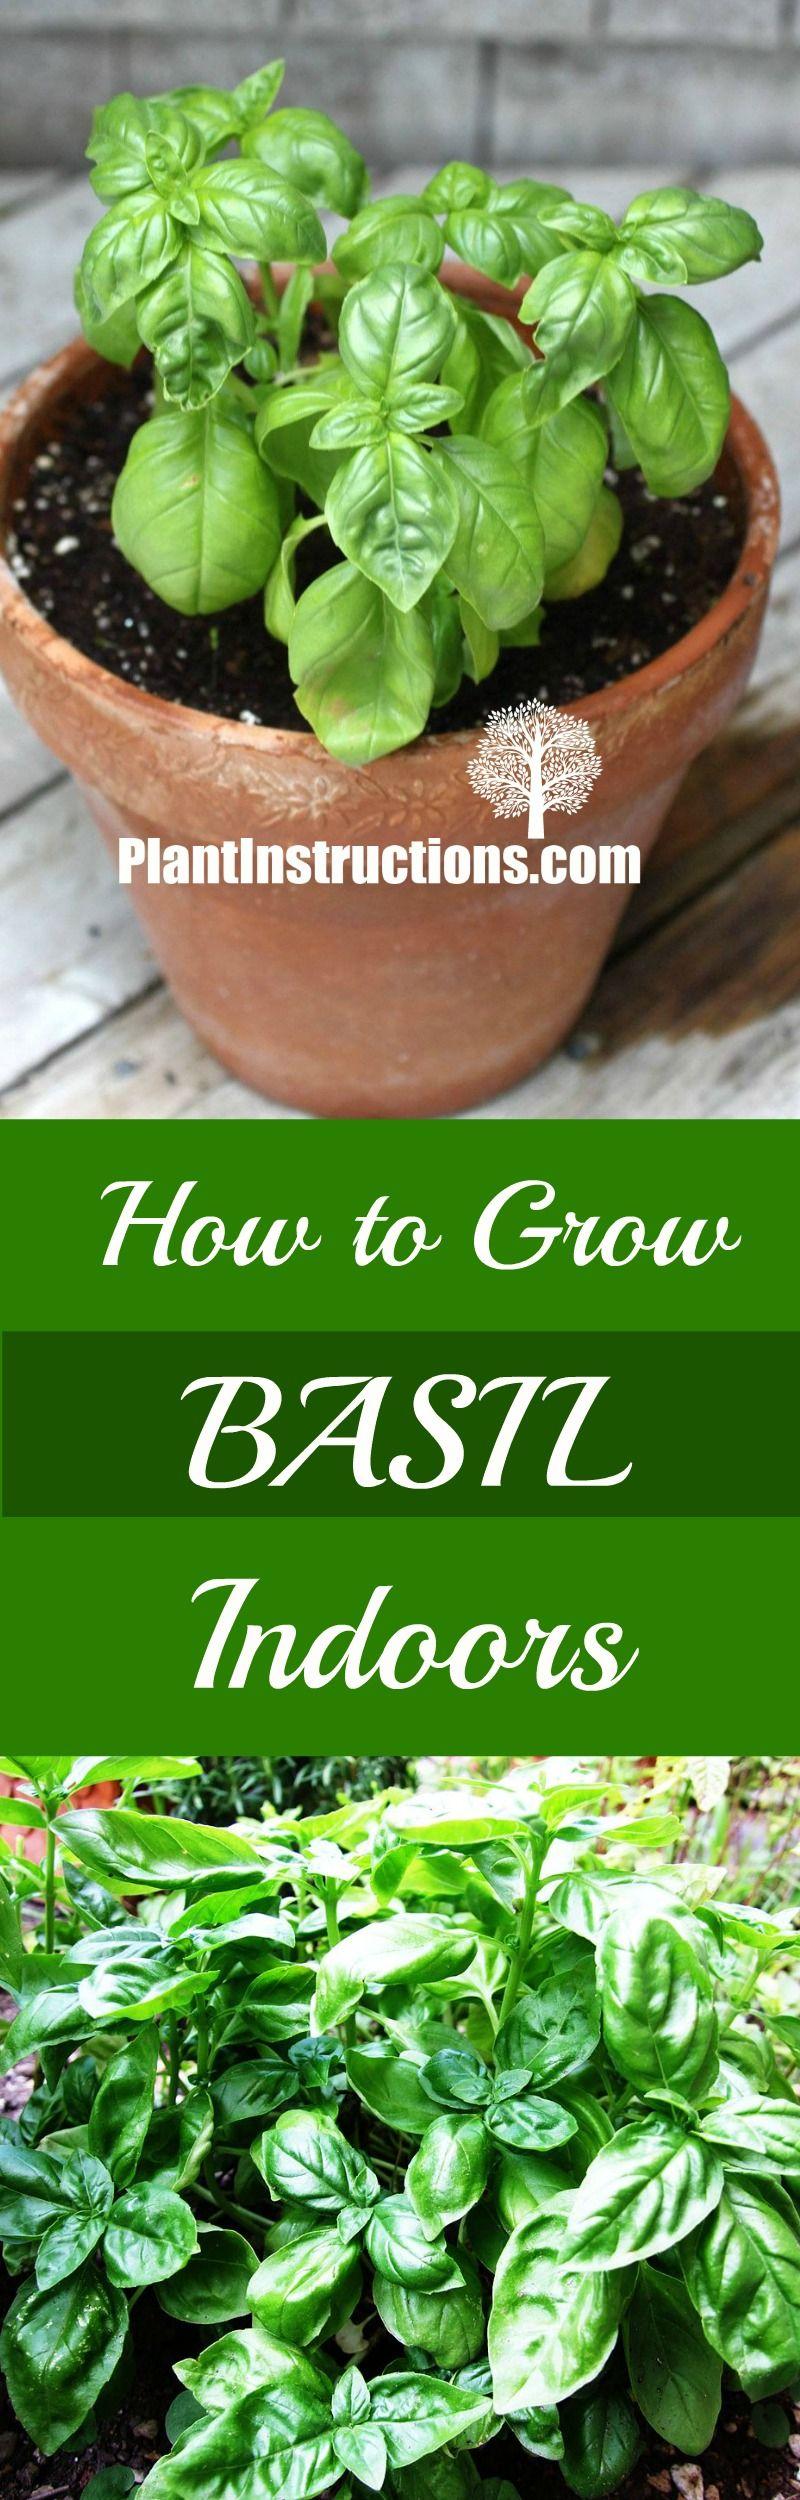 How to grow basil indoors growing basil indoors indoor